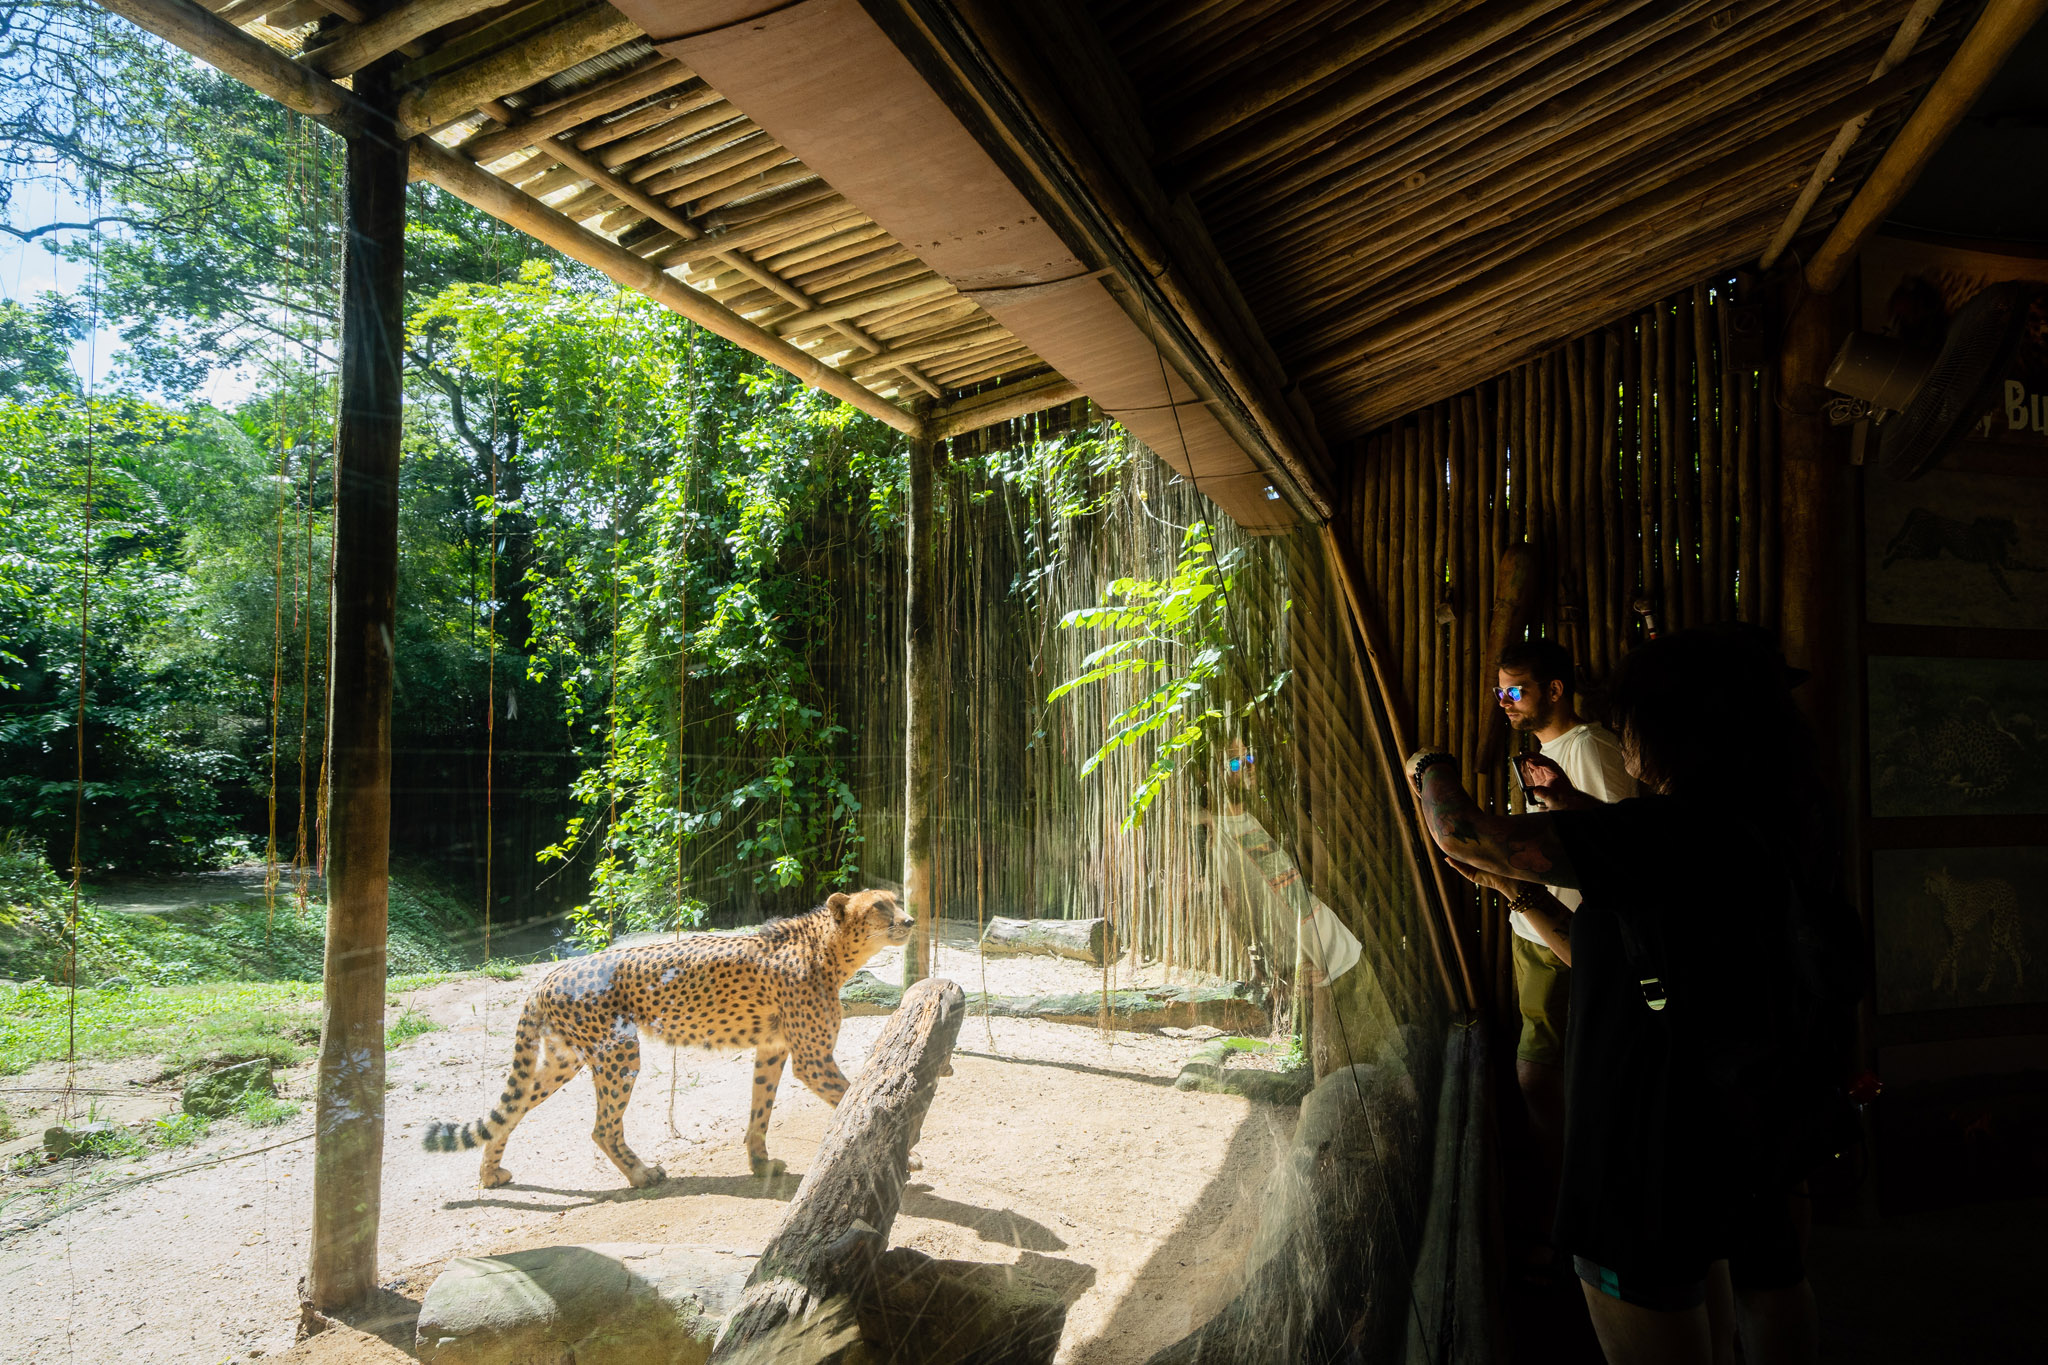 viator-singapore-photographer-tourism-tours-zoo-little-india-gardens-marina-bay-009.jpg